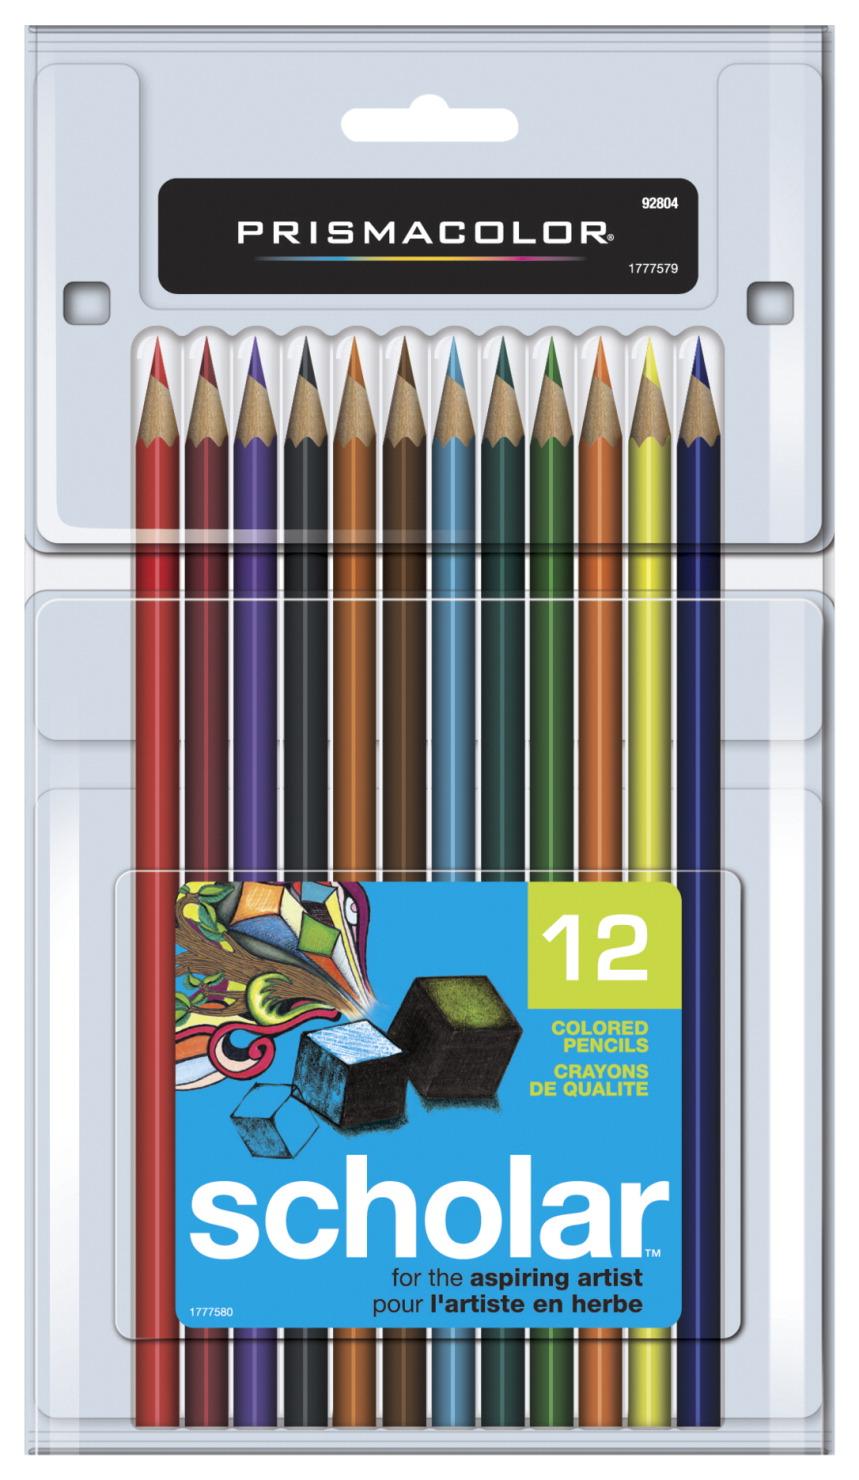 Prismacolor Scholar 12 Colored Pencils for Artists NEW